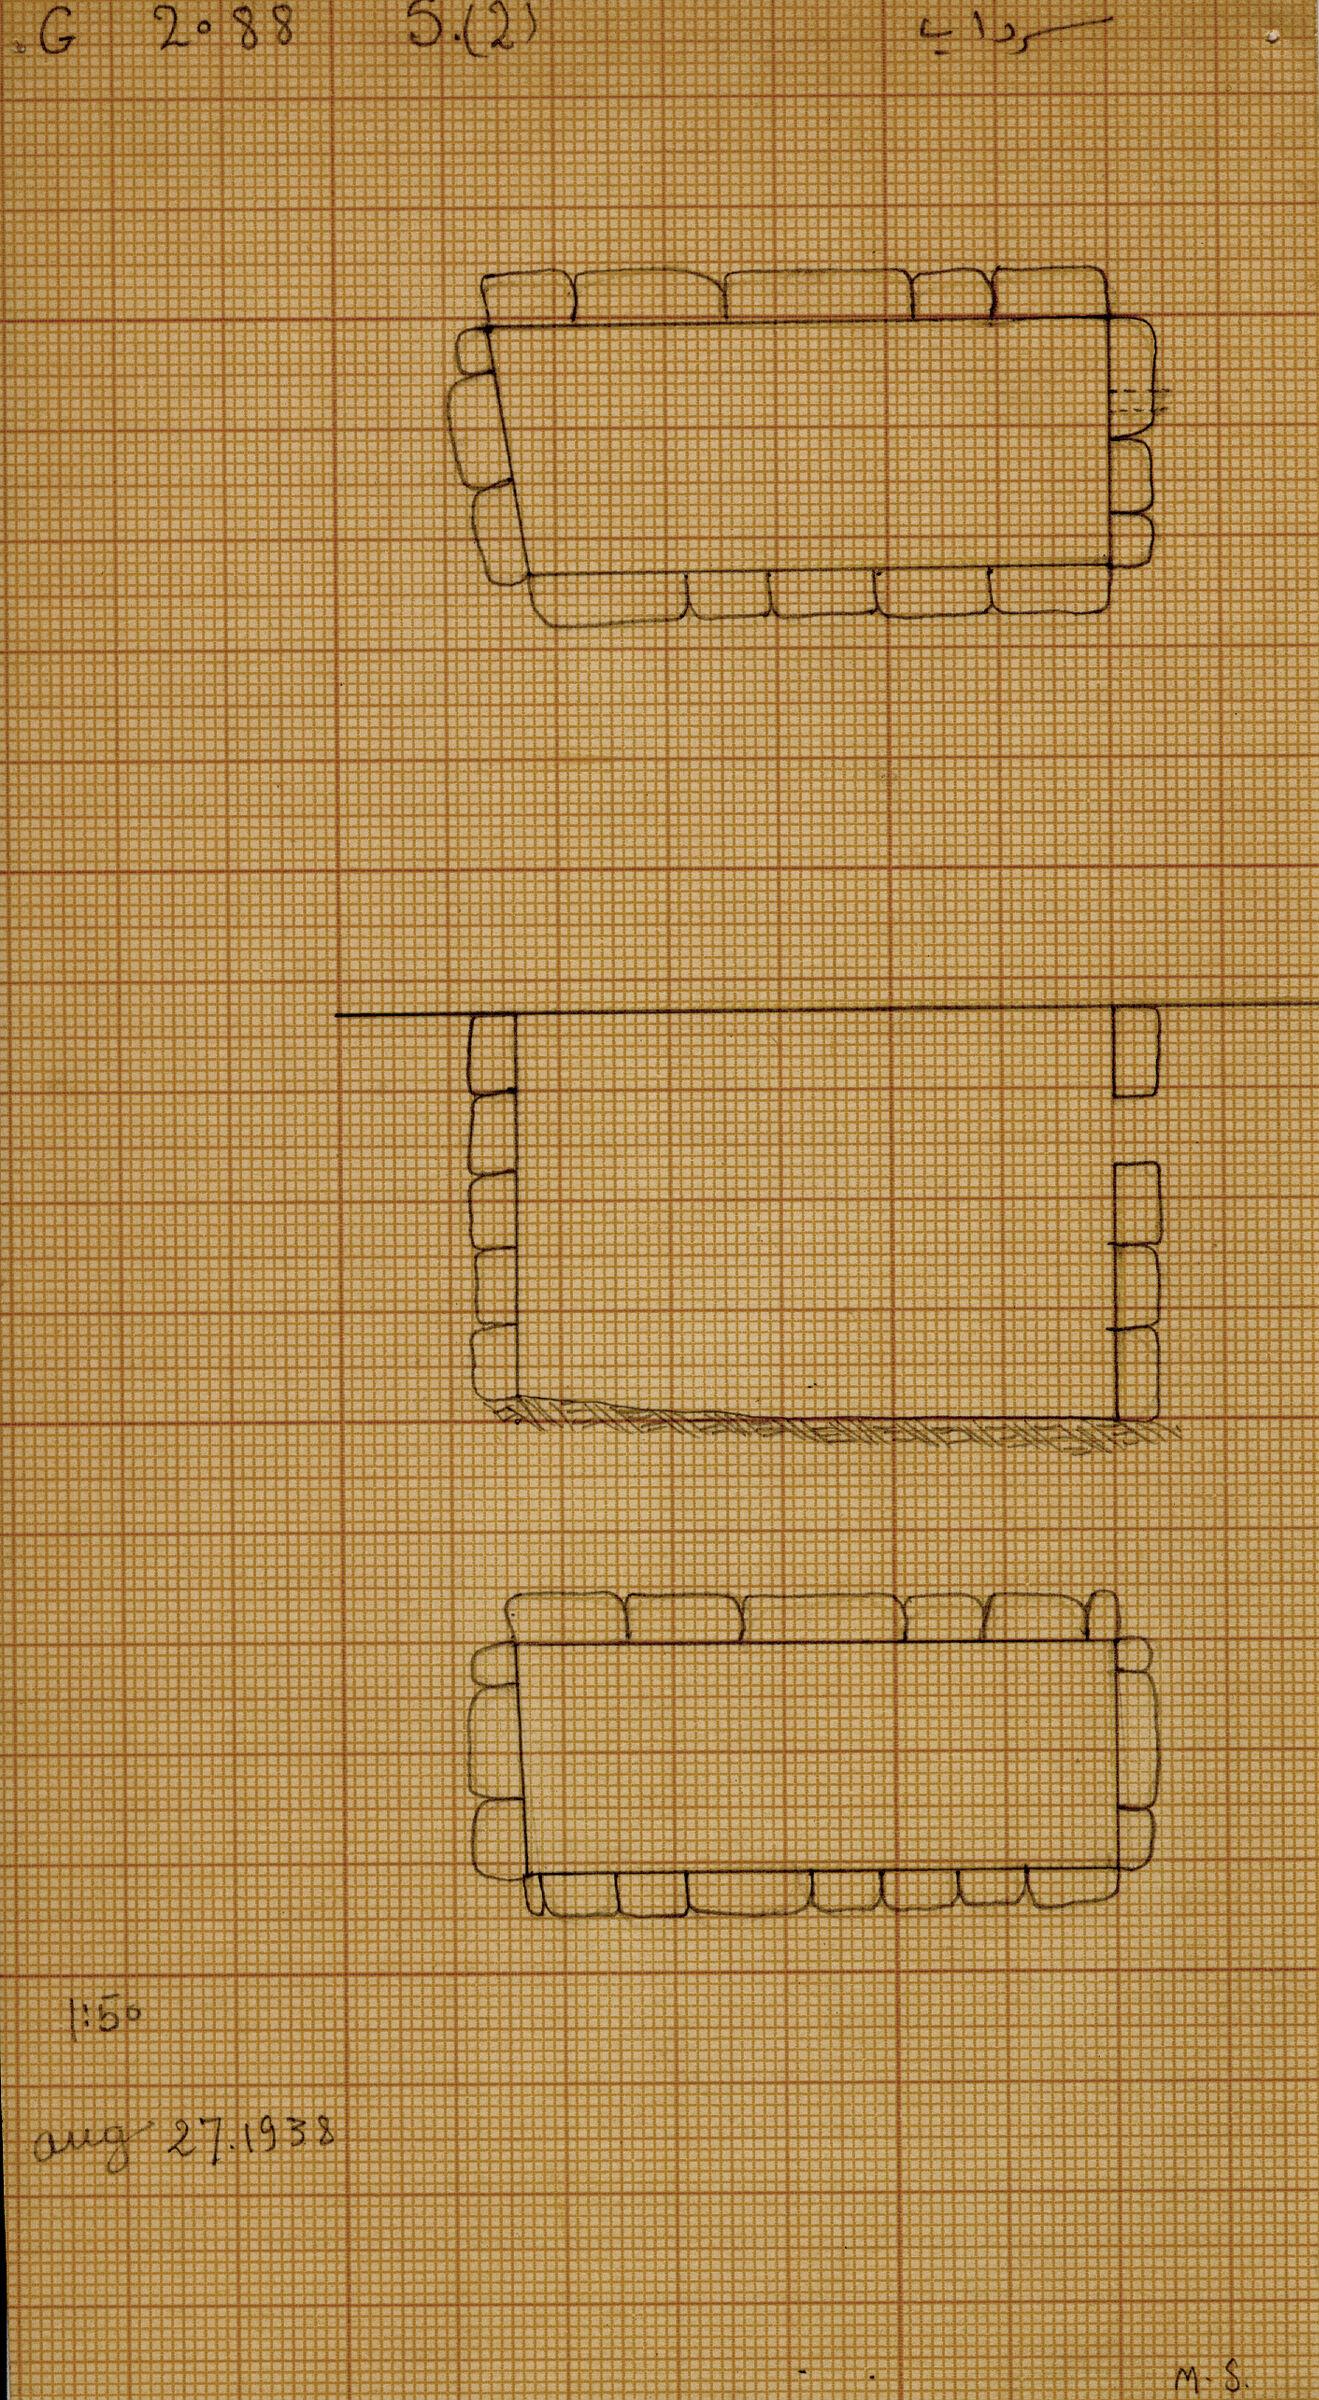 Maps and plans: G 2088, Serdab 2